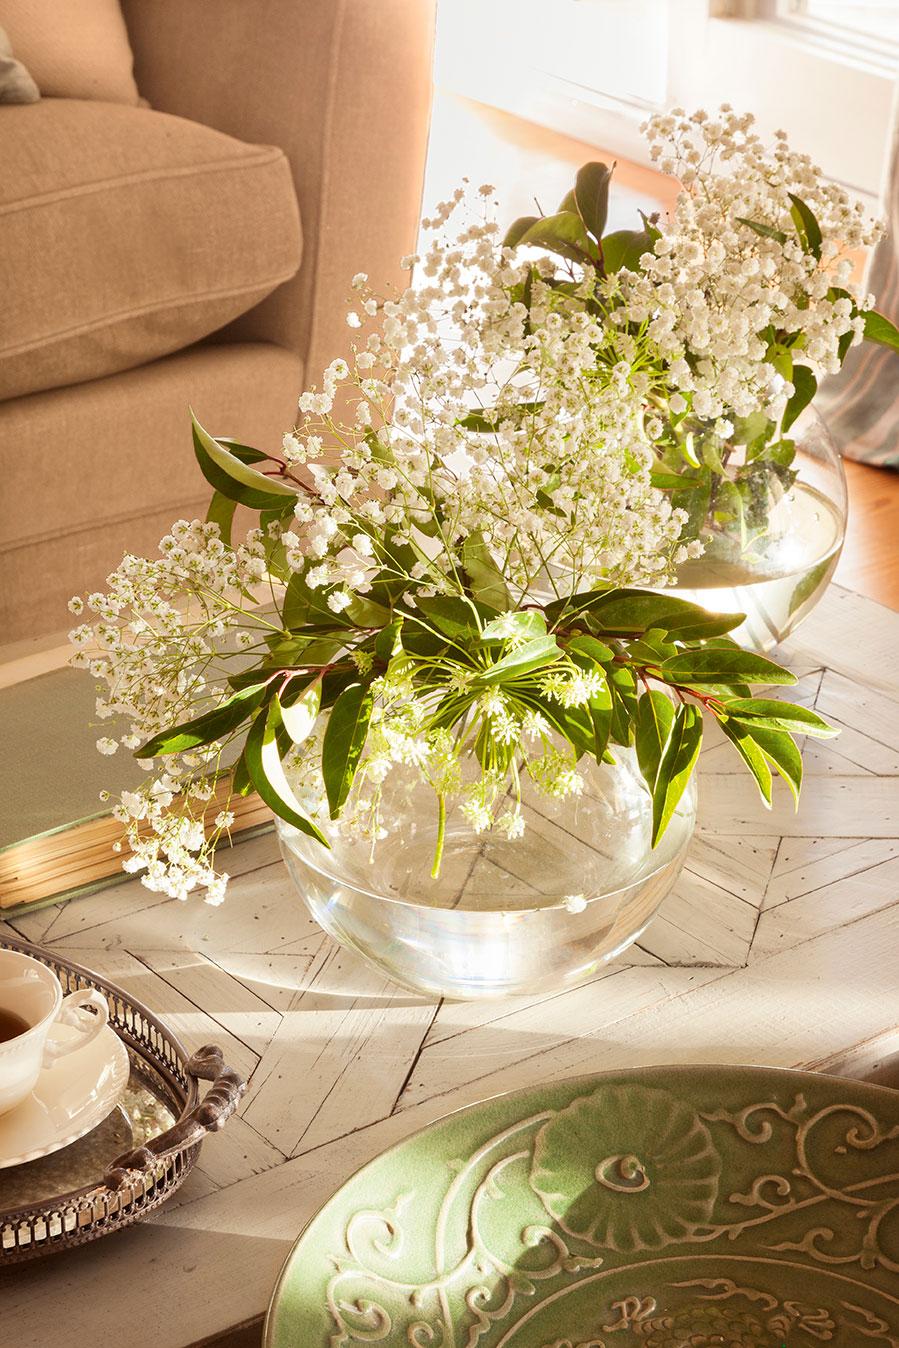 La mesa de centro perfecta consejos para decorarla bien - Sobre de cristal para mesa ...